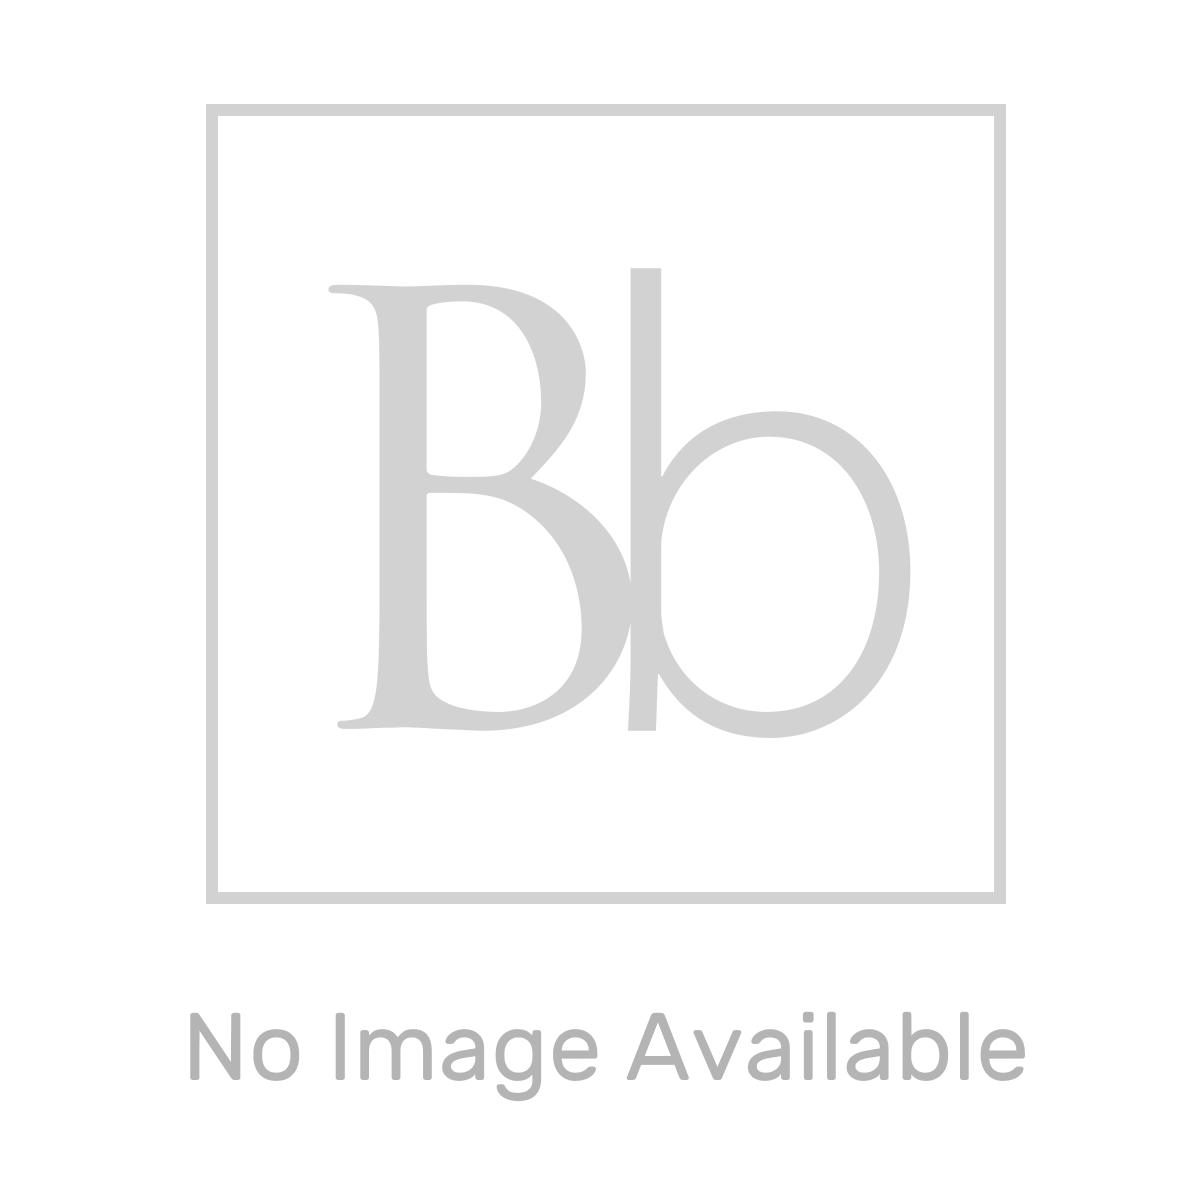 Aquadart White Slate Shower Tray 1100 x 900 Lifestyle